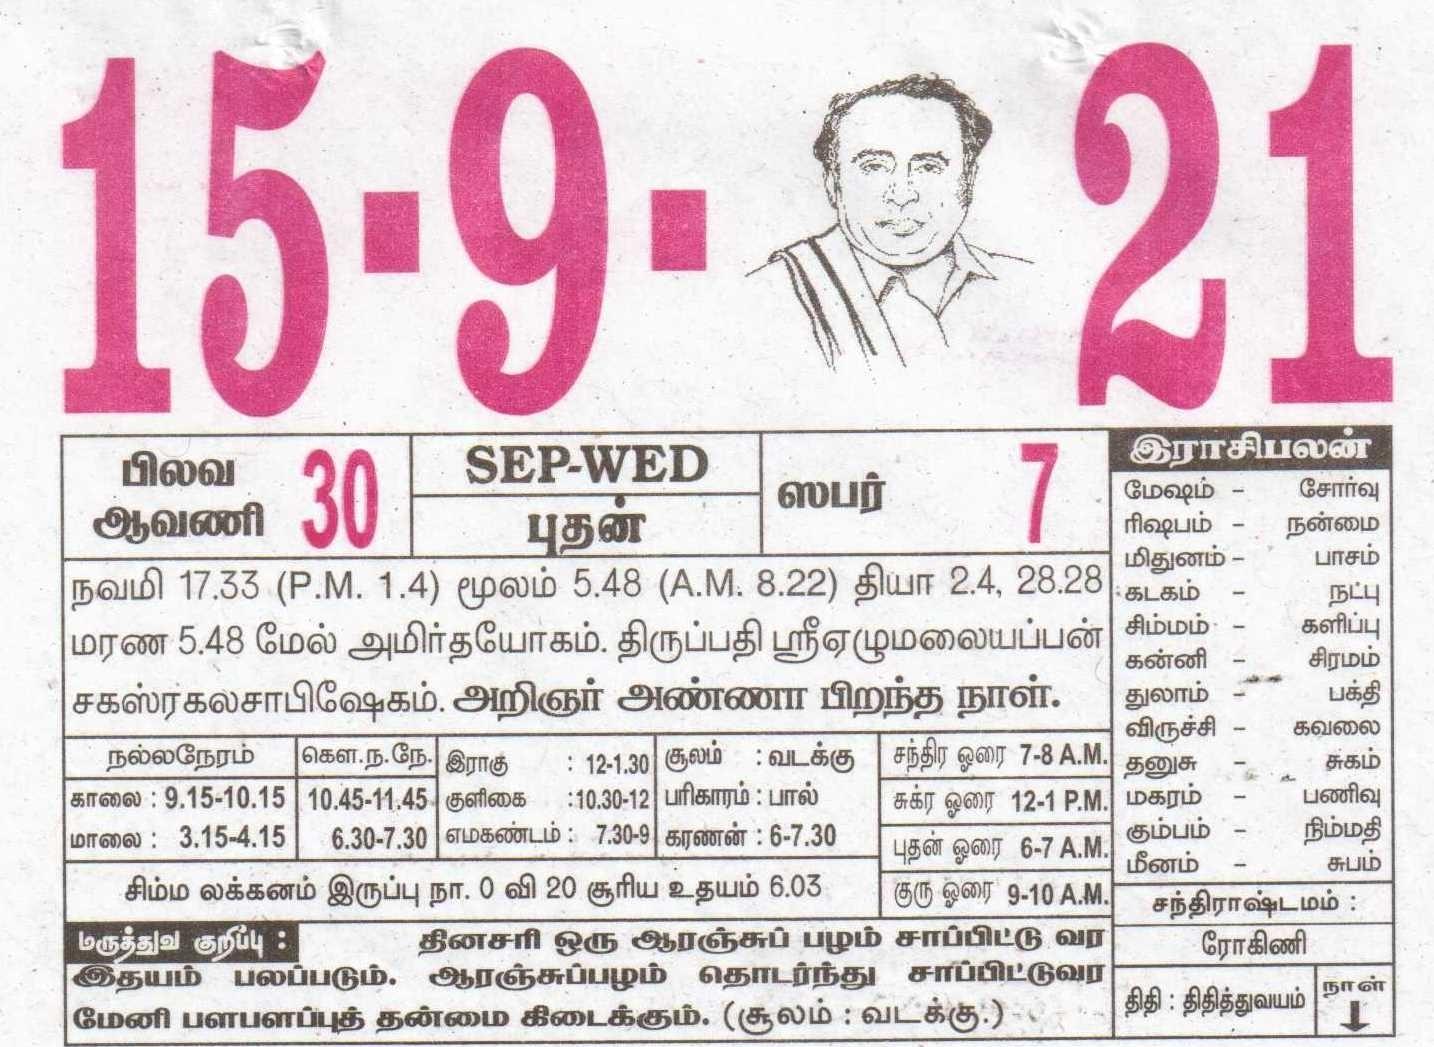 15-09-2021 Daily Calendar | Date 15 , January Daily Tear Off Calendar | Daily Panchangam Rasi Palan June 2021 Tamil Daily Calendar